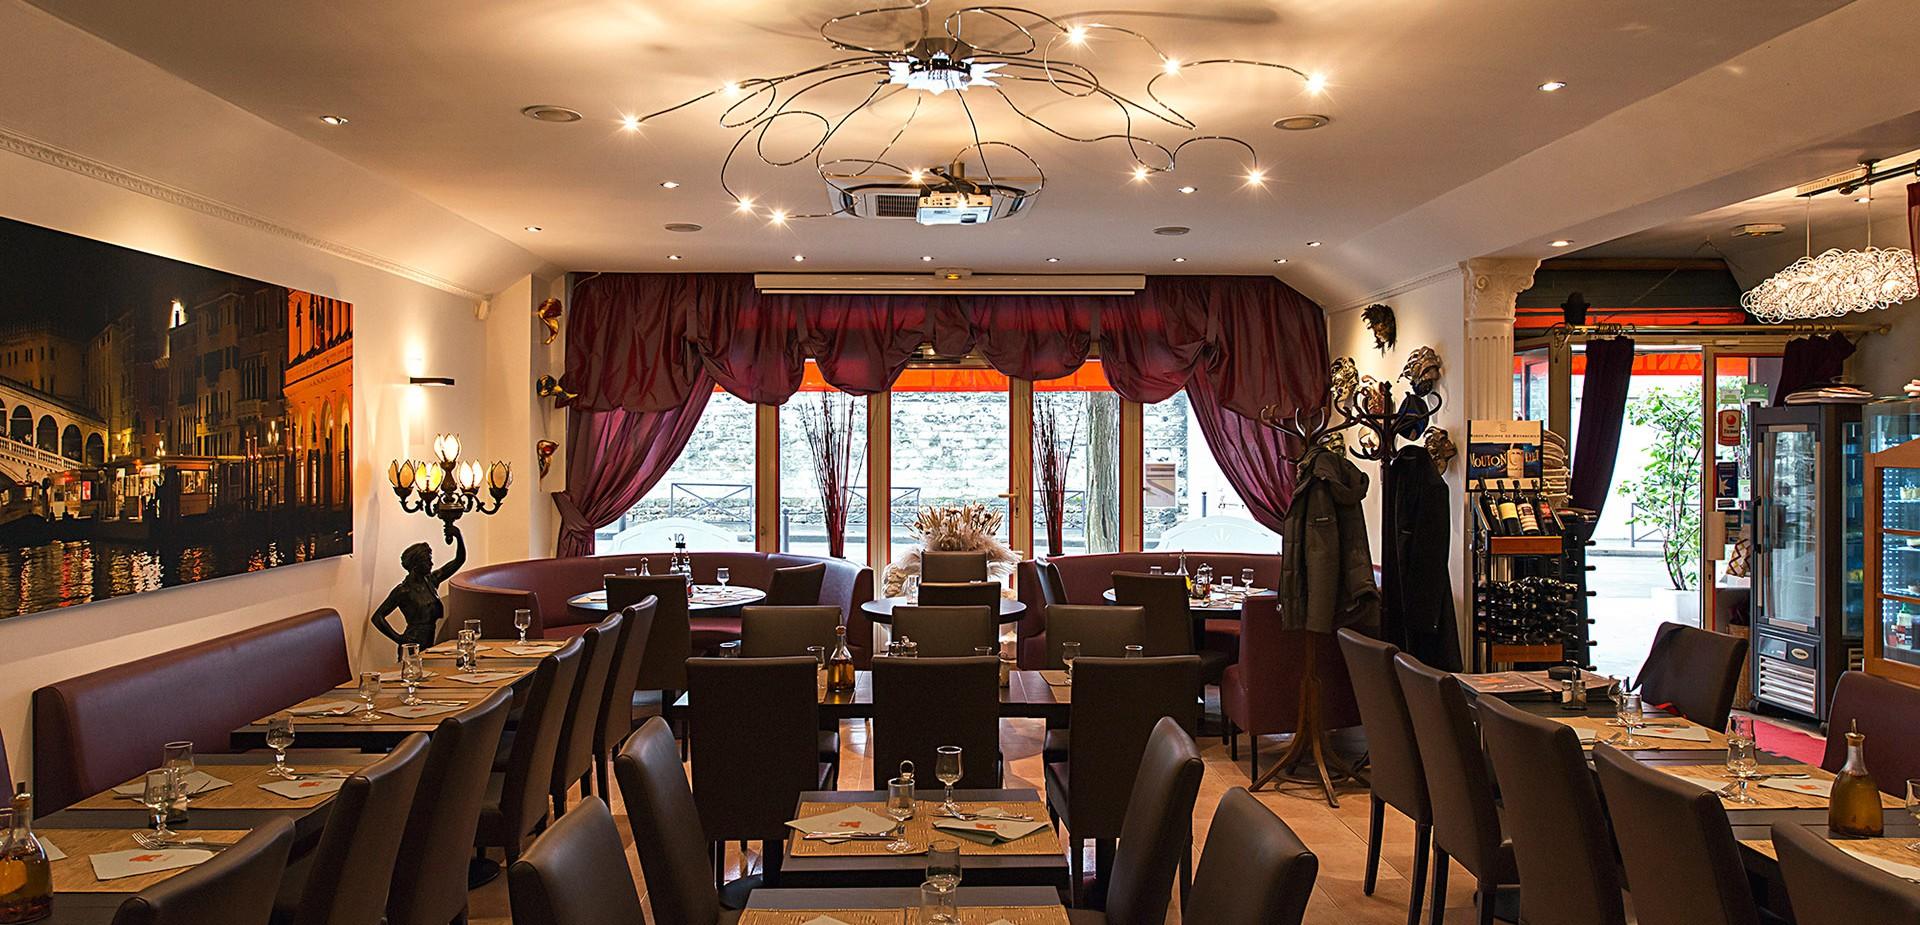 venezia restaurant italien paris 12 la vita e bella. Black Bedroom Furniture Sets. Home Design Ideas